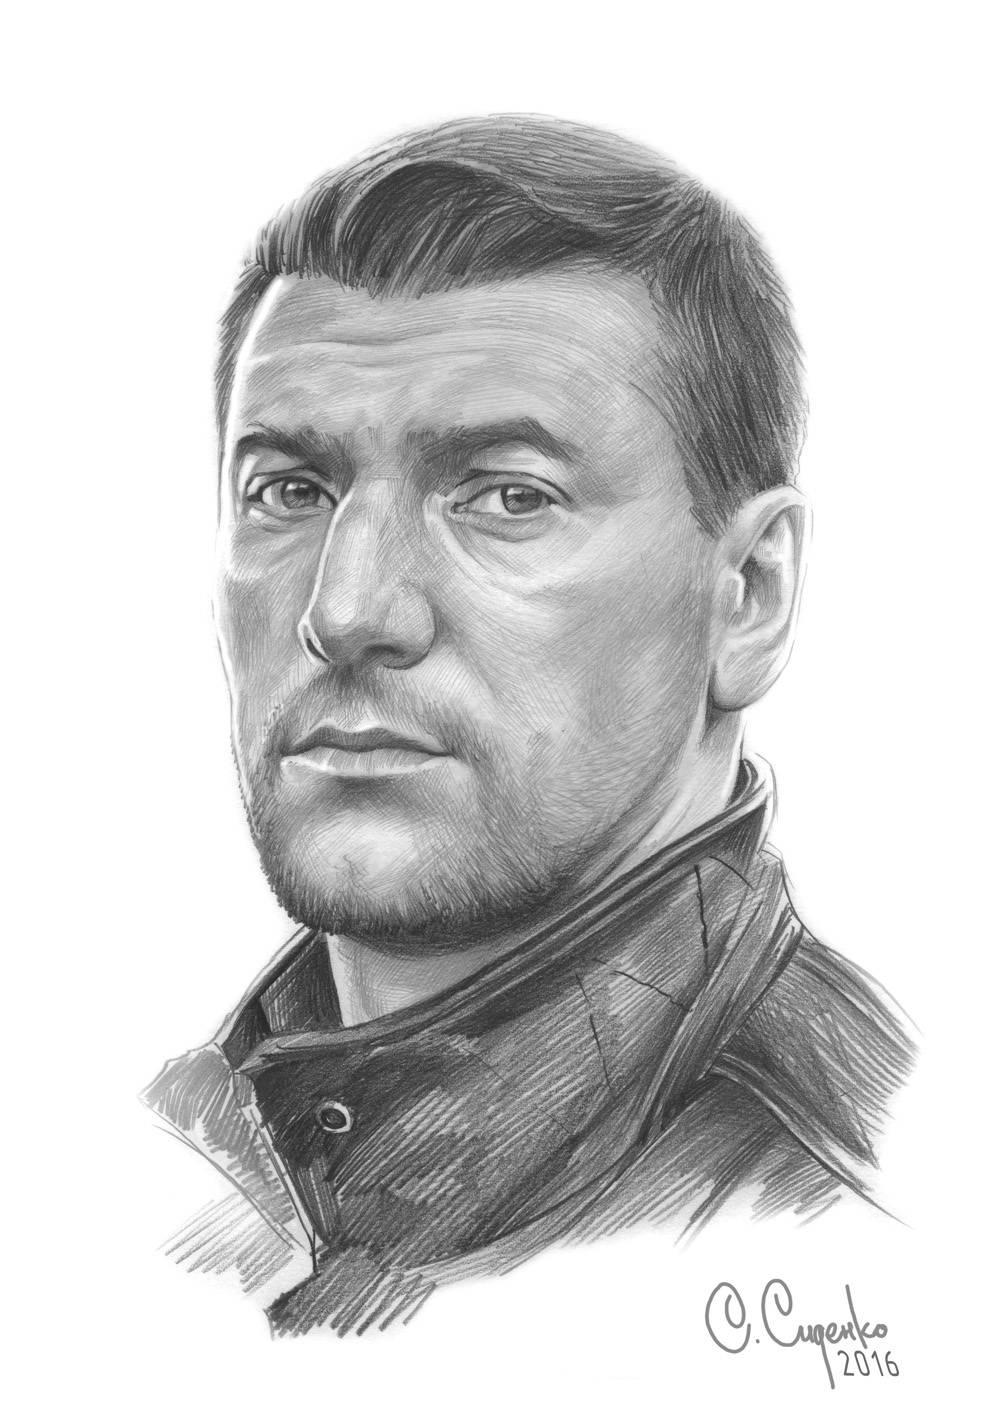 Р.Устюгов